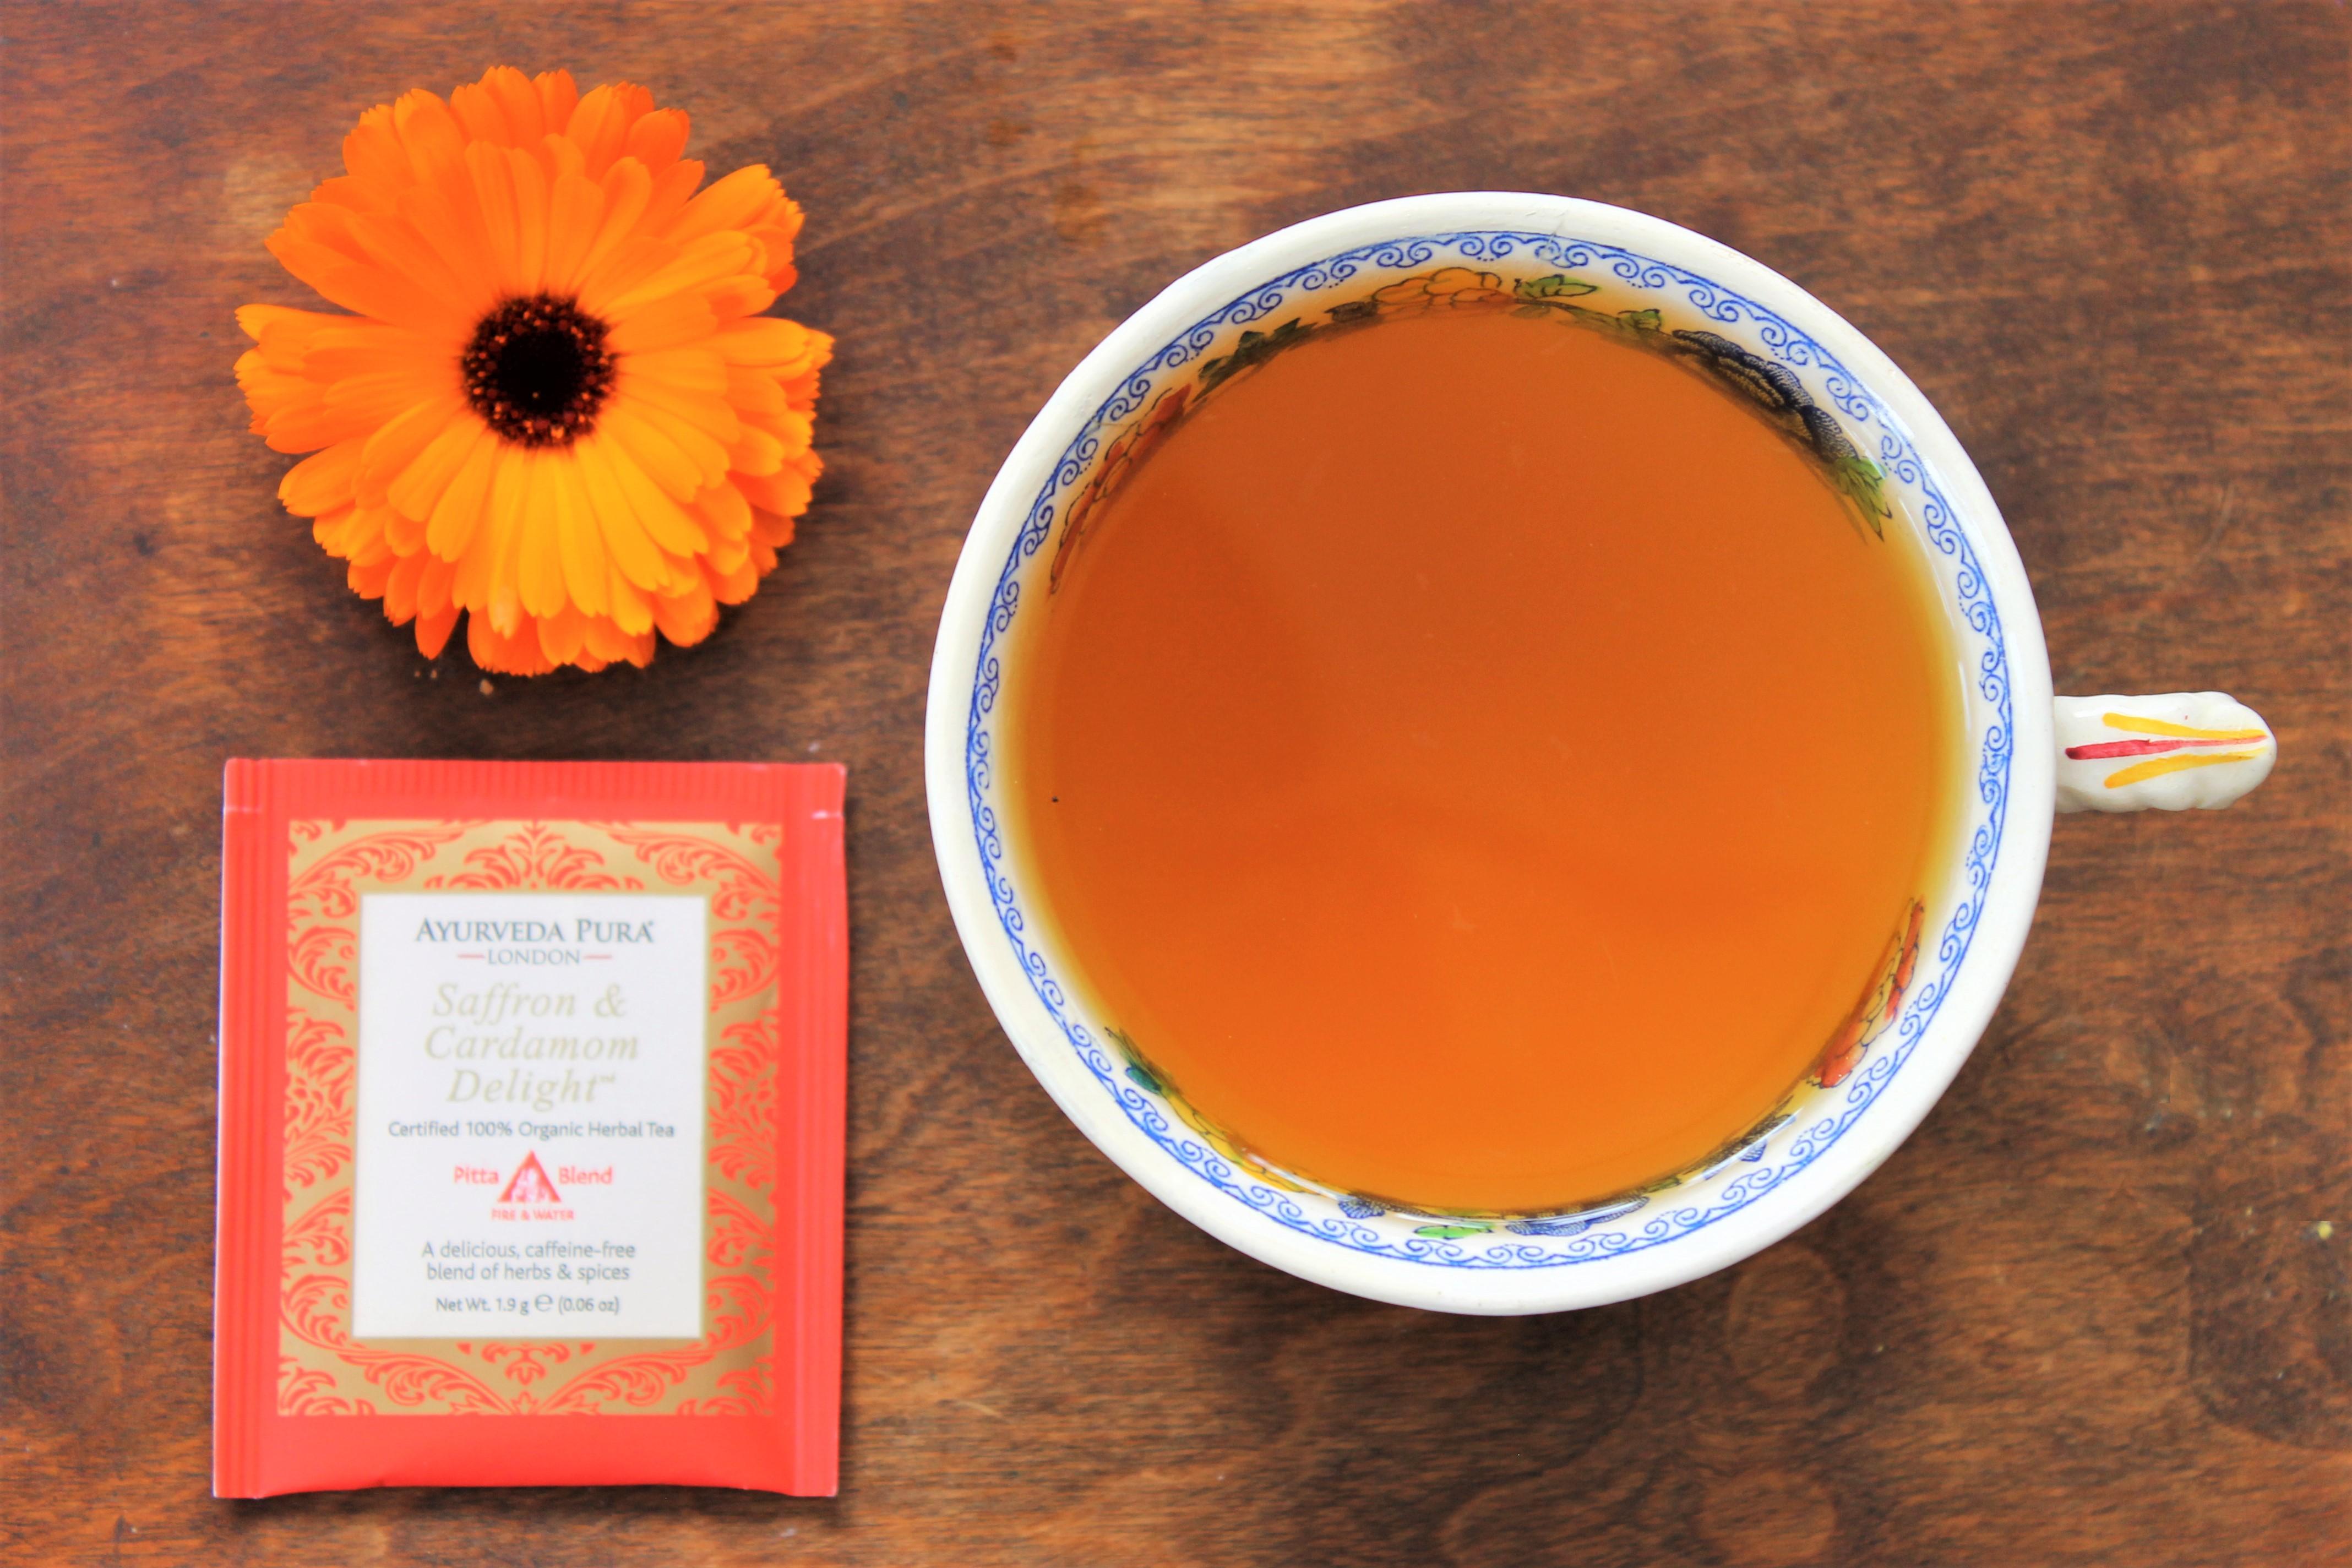 Ayurveda Pura Saffron & Cardamom Delight Tea Review